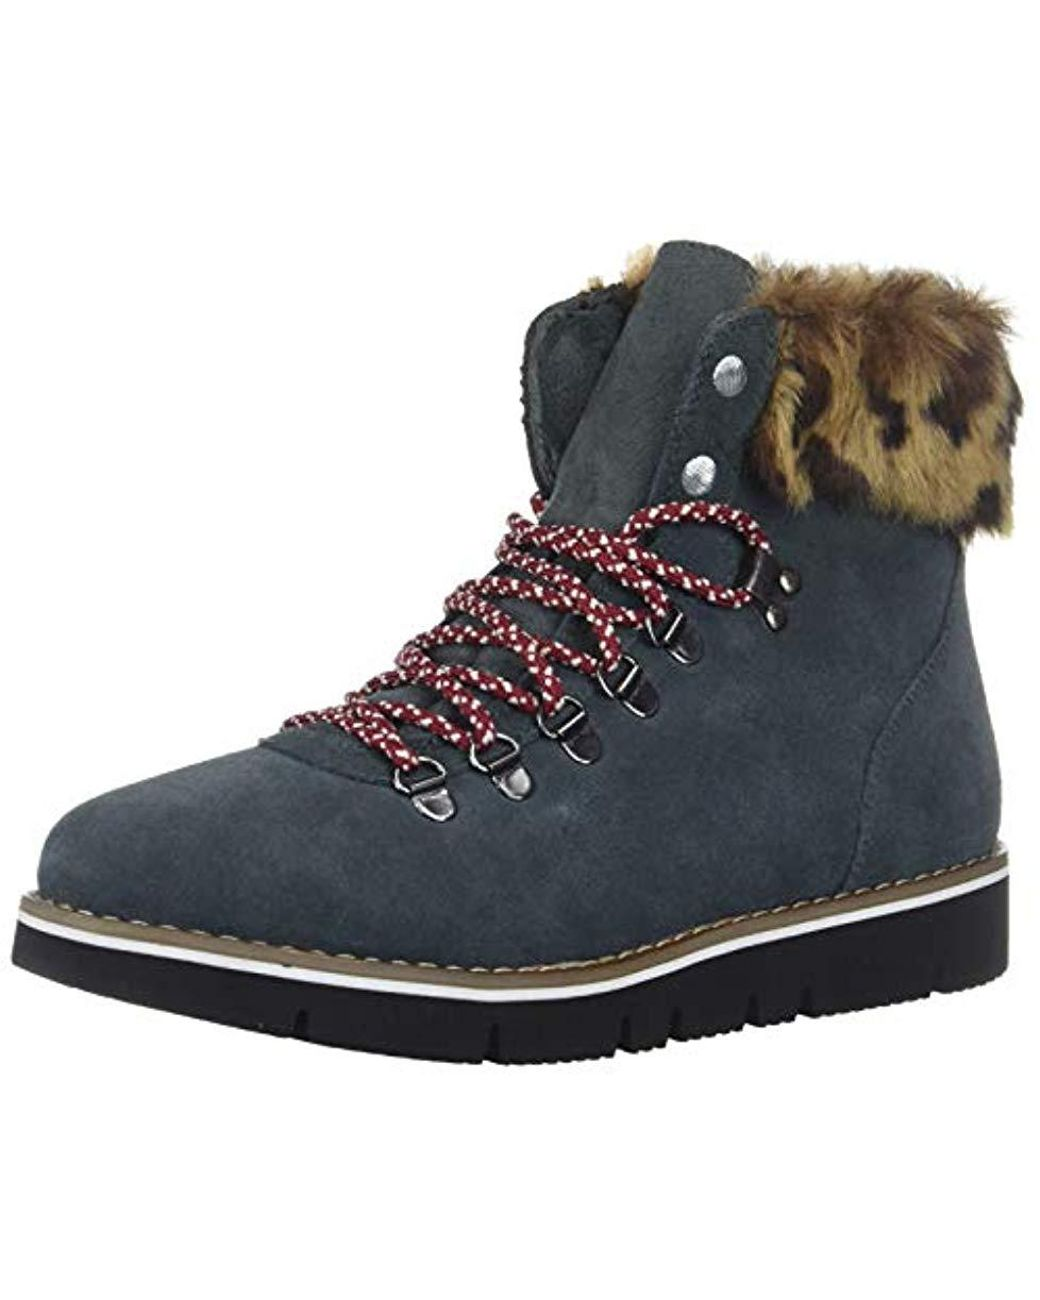 Skechers Bobs Bobs Rocky. Fashion Fur Trim Hiking Boot W